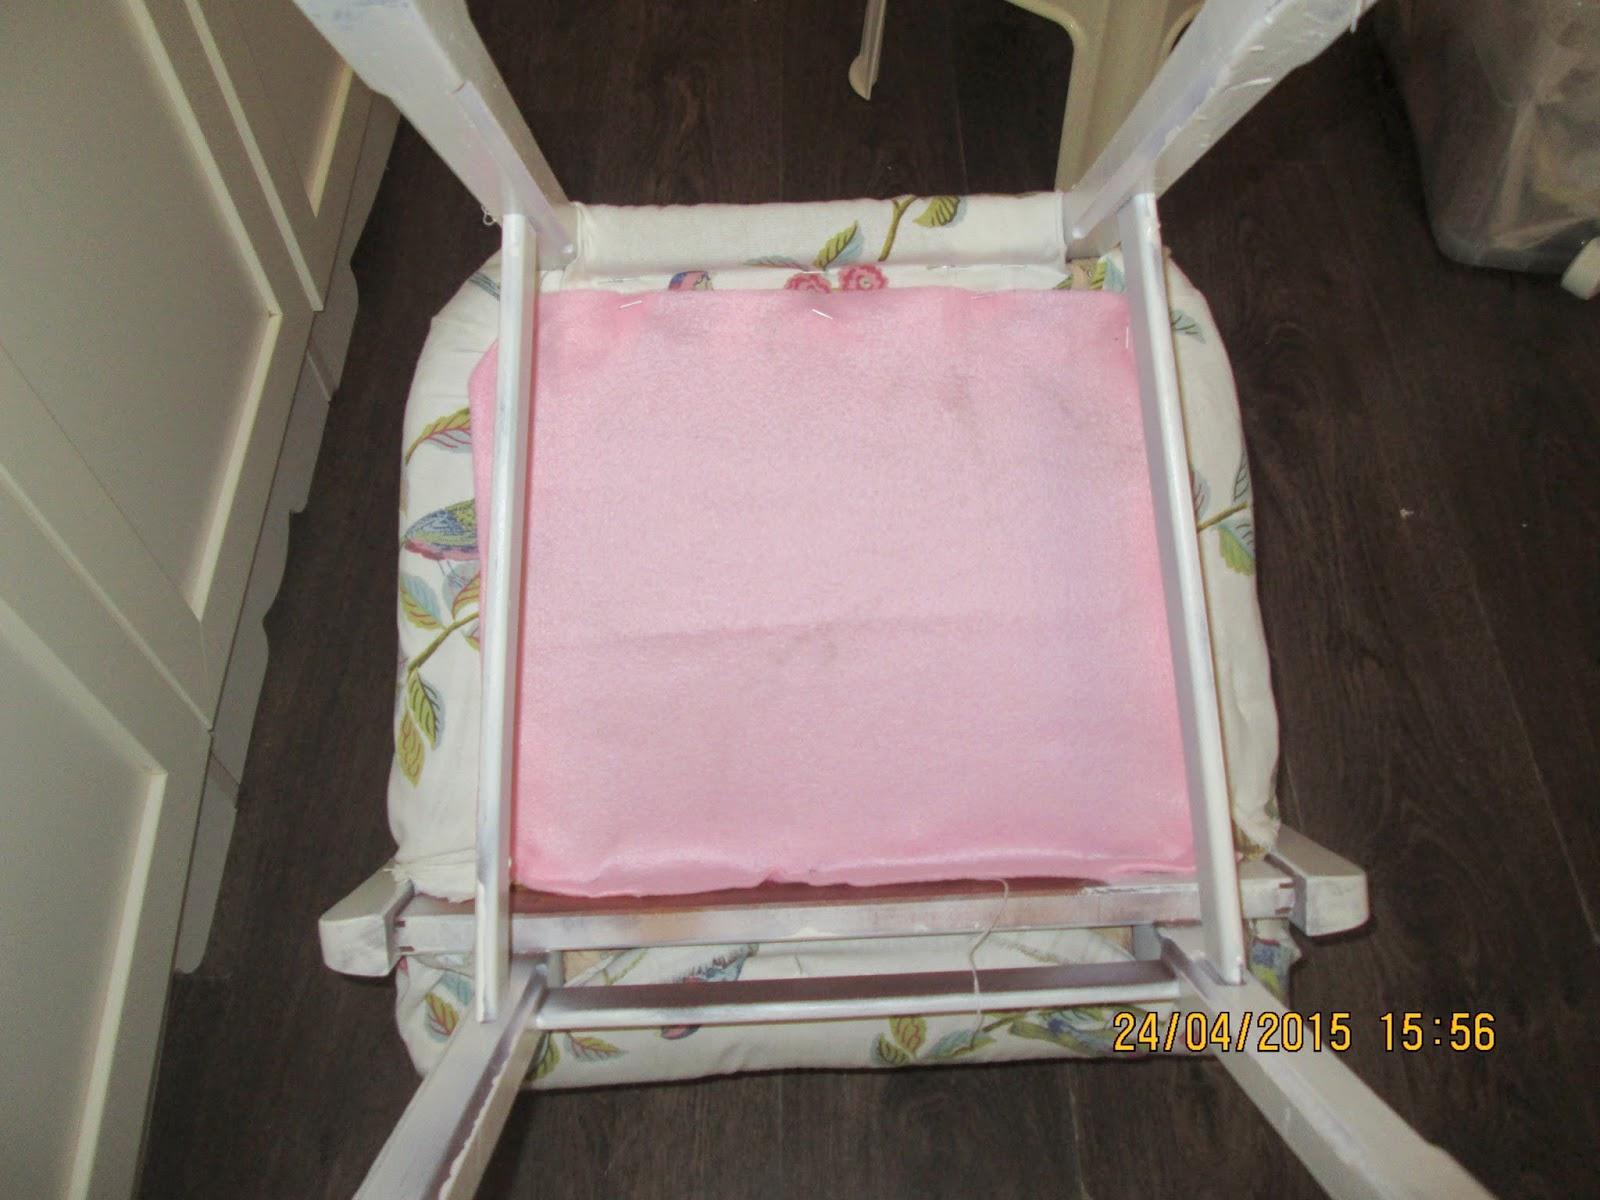 IMG 0059 - שדרוג כורסא ישנה